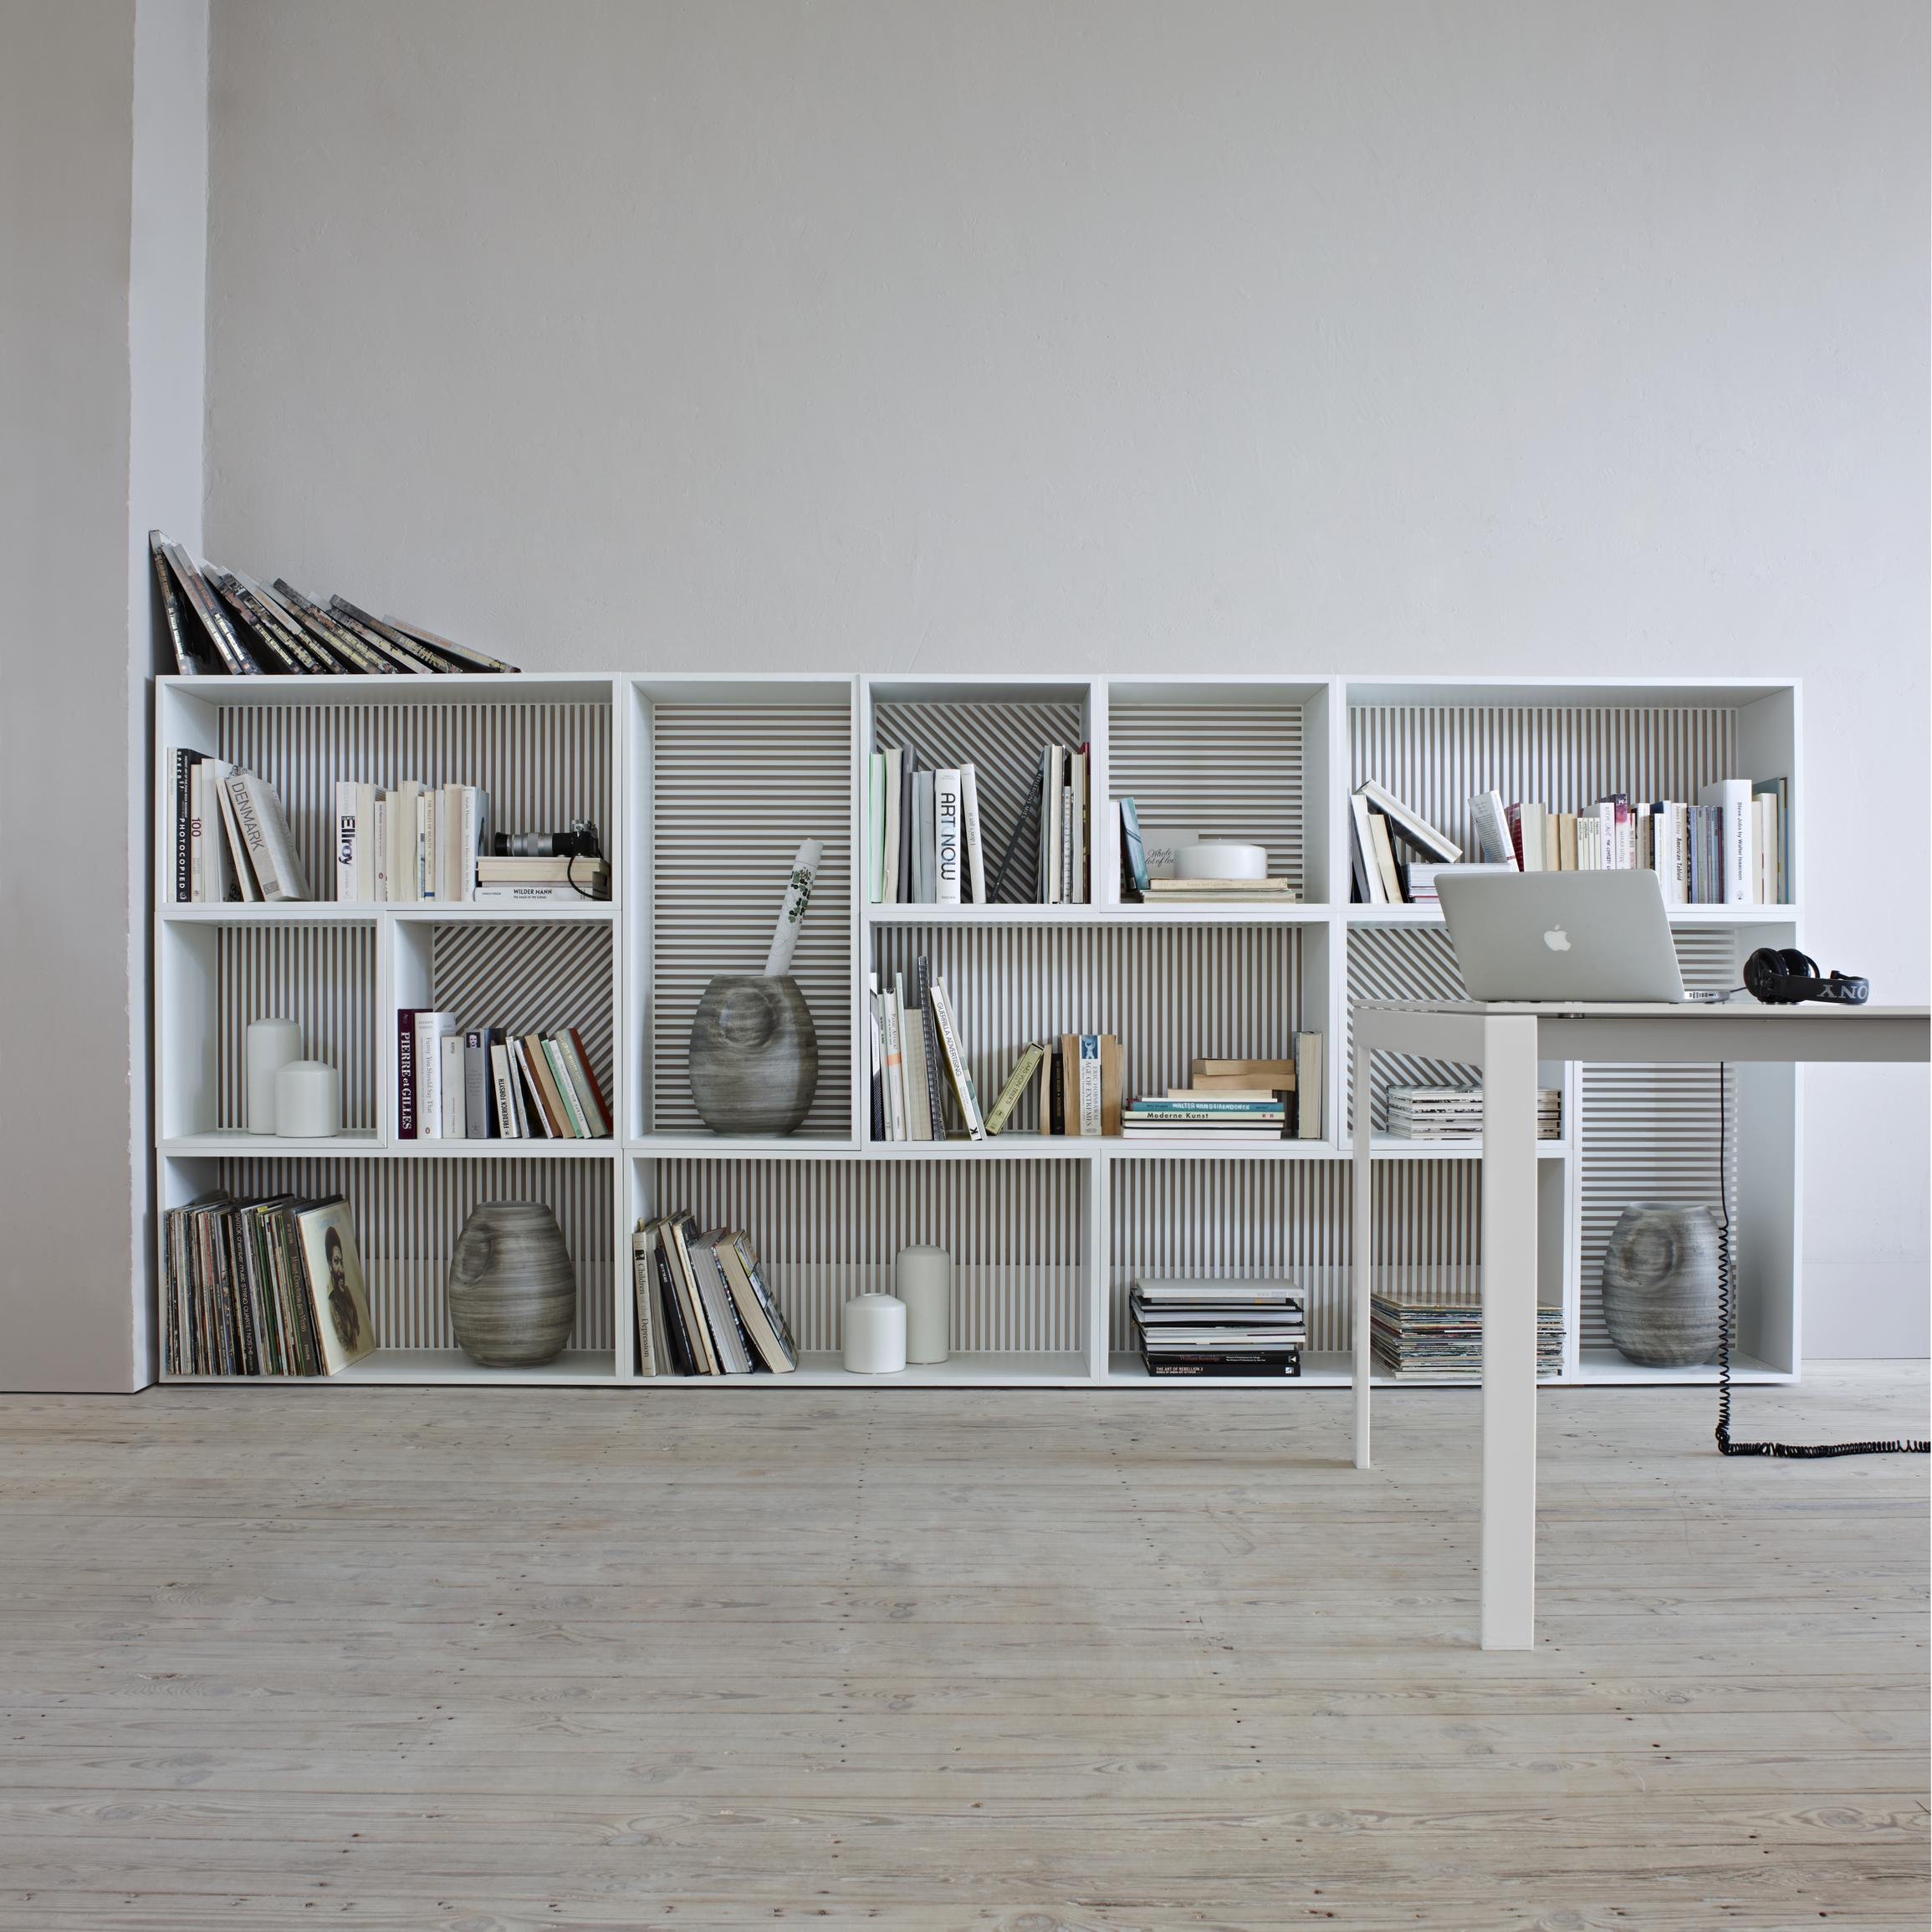 Persienne Shelving Units Designer Arnaud Lapierre Ligne Roset # Muebles Novo Stylo